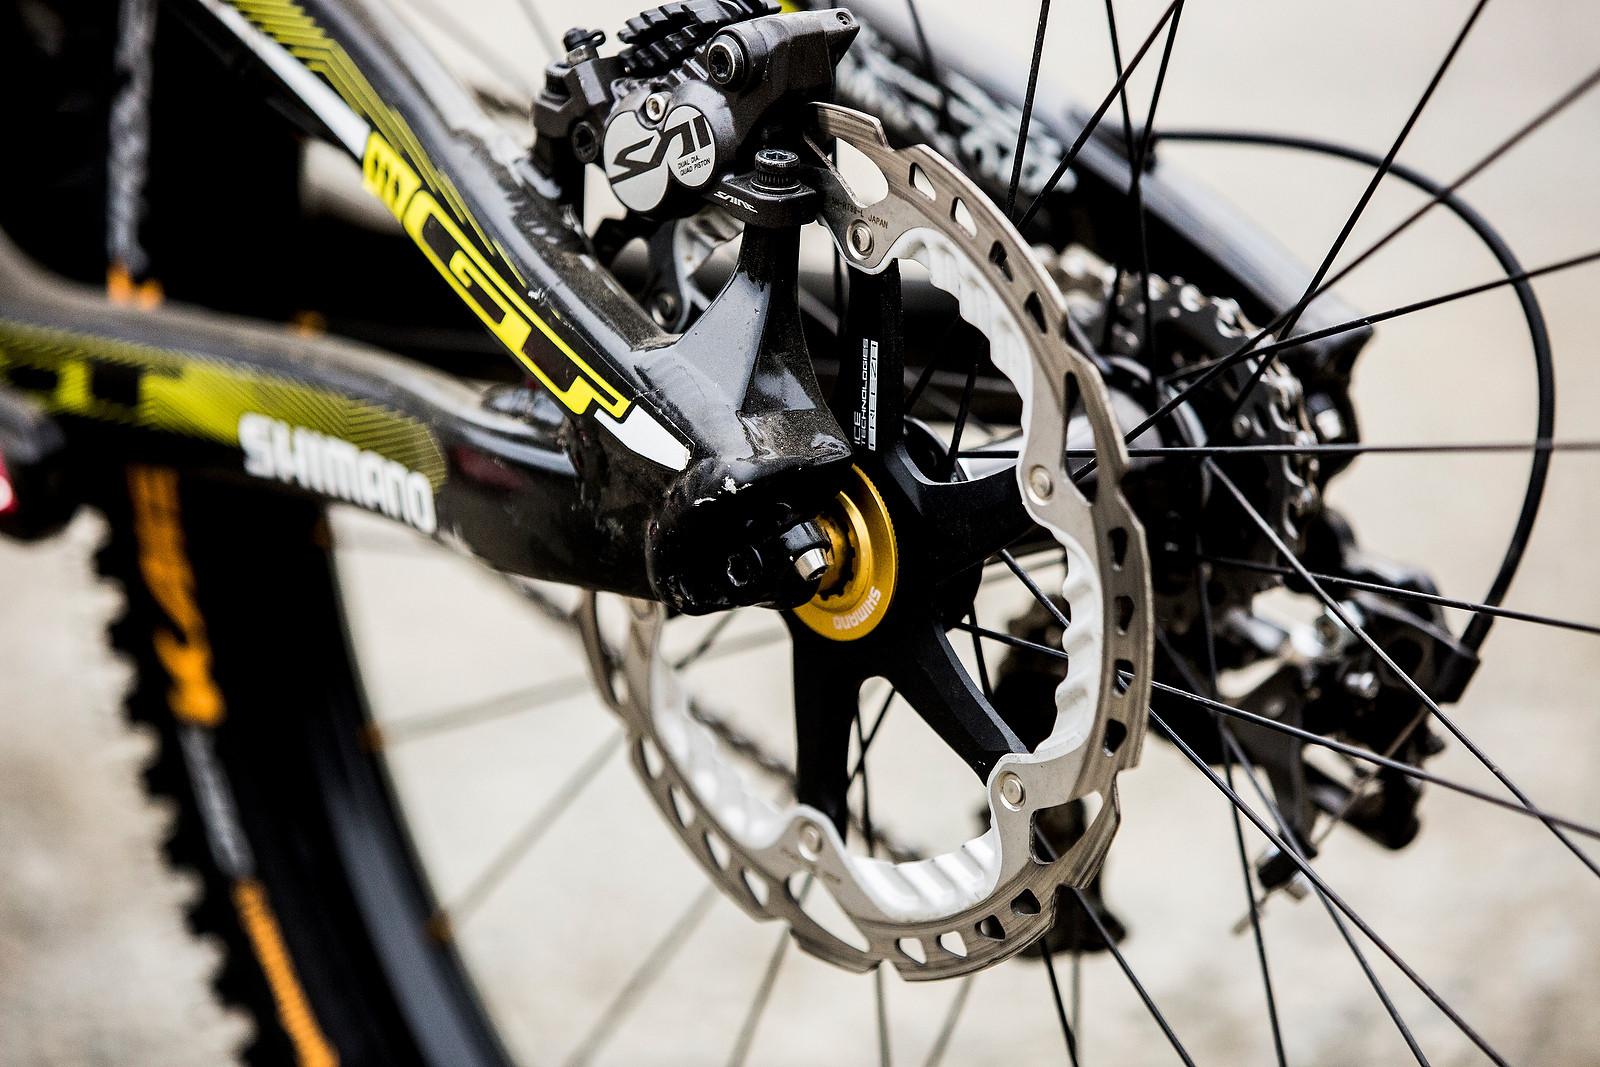 Shimano Saint Brakes With Ice Tech Rotors Winning Bike